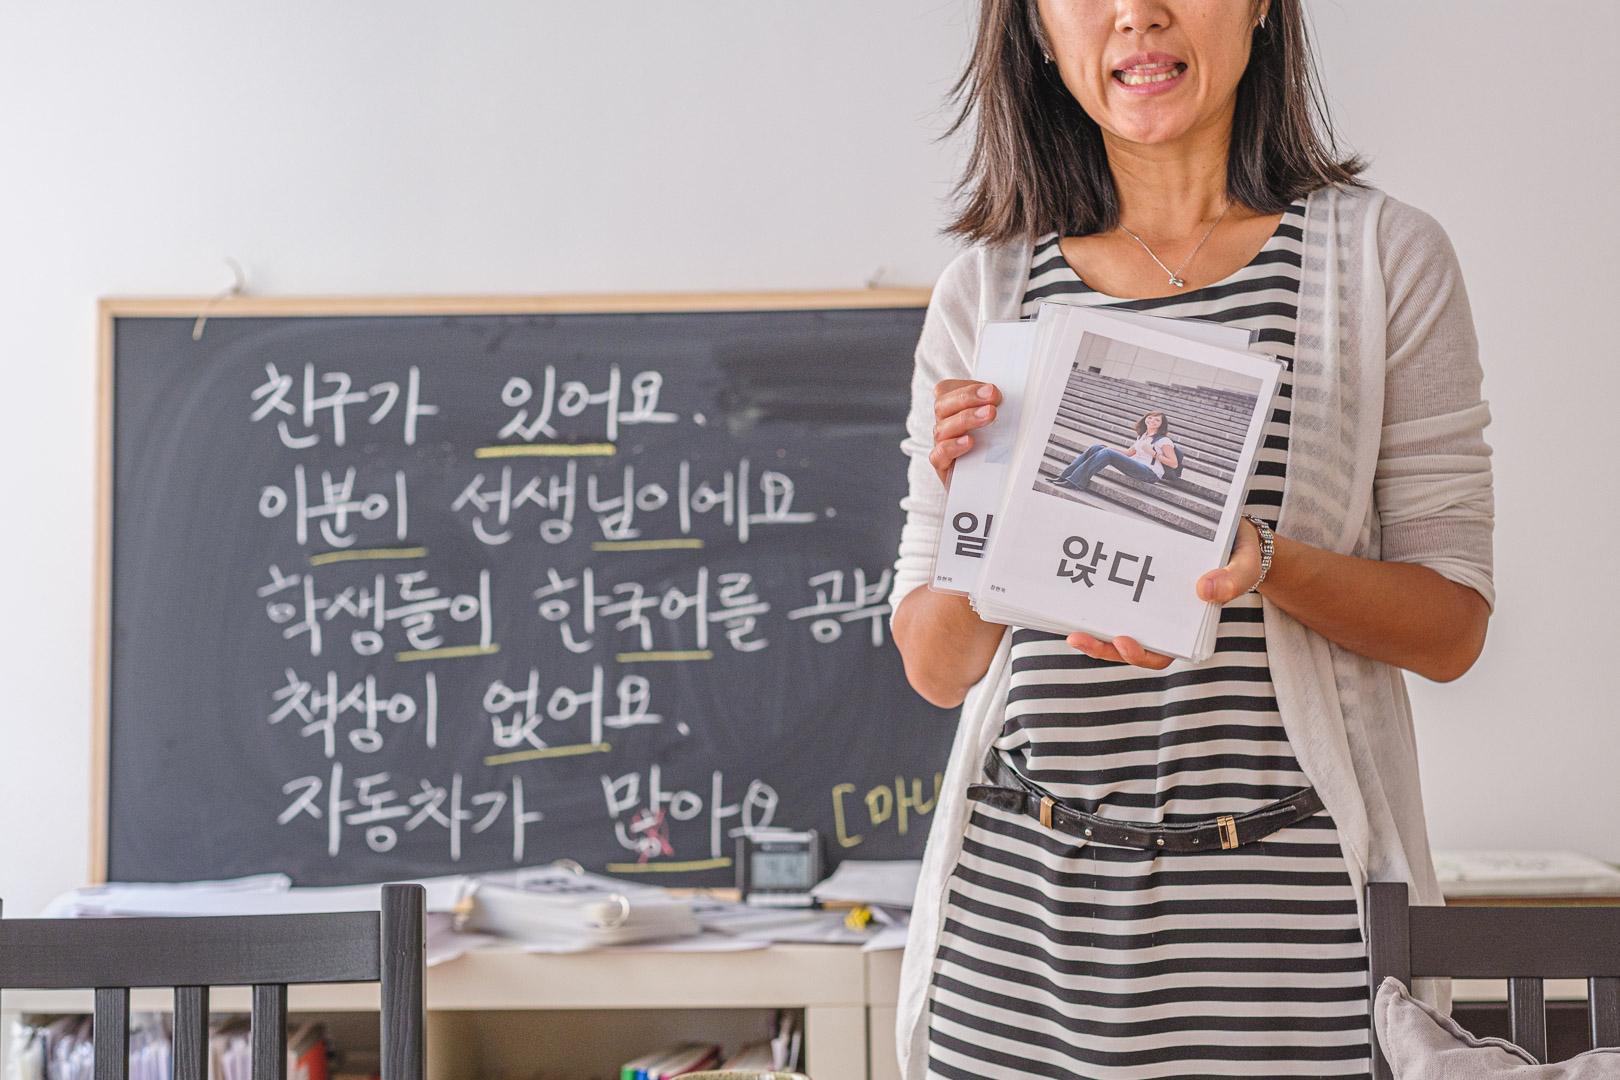 Koreanischkurs Salzburg